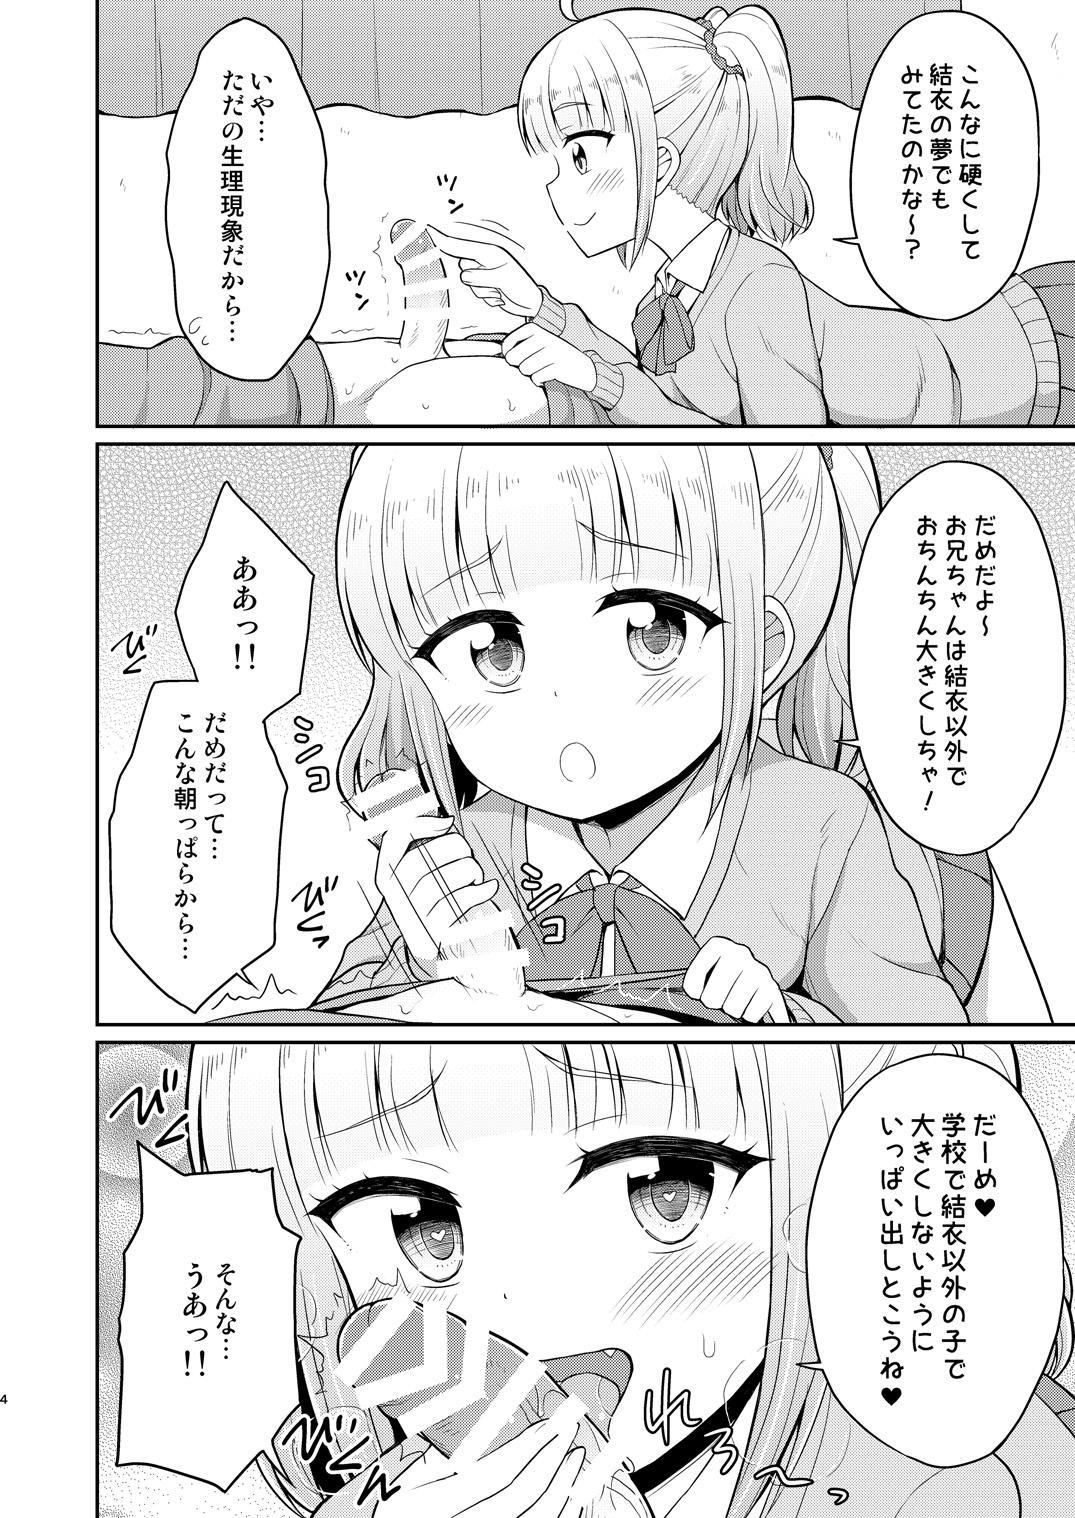 Onii-chan Daisuki H Shiyo 2 3